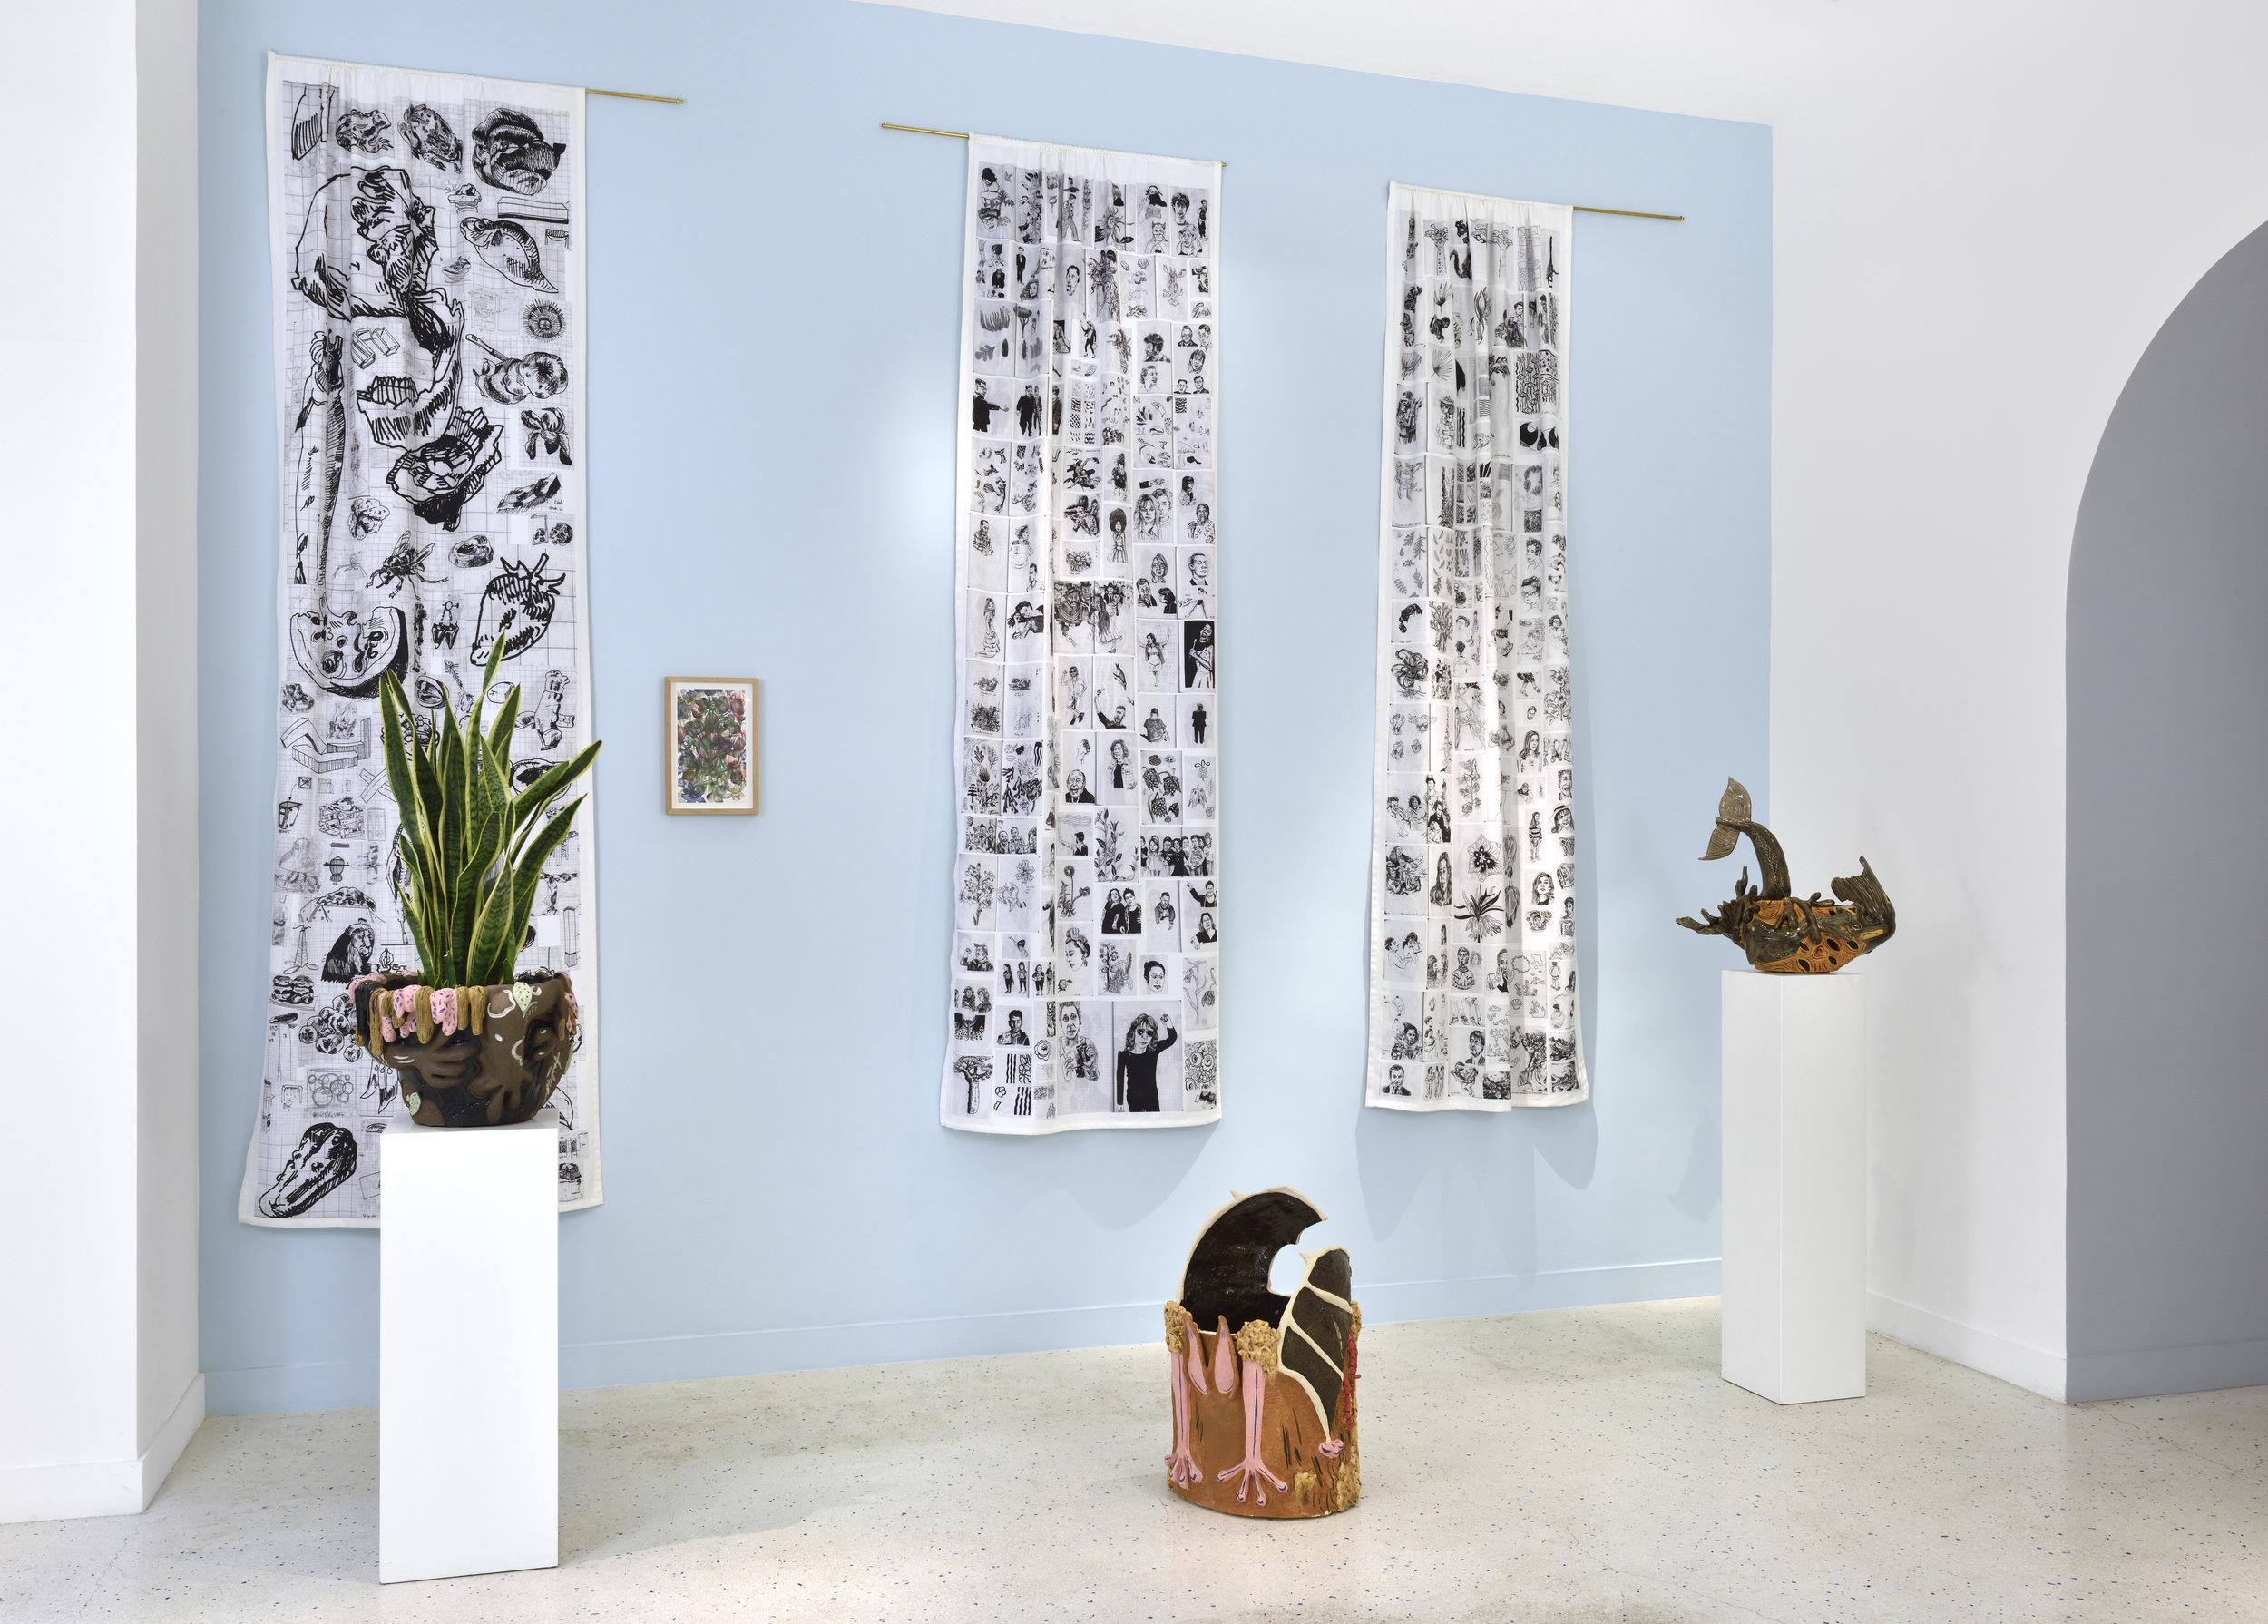 Crédit Photo Rebecca Fanuele  Courtesy Galerie Lefebvre & Fils & Lamarche-Ovize